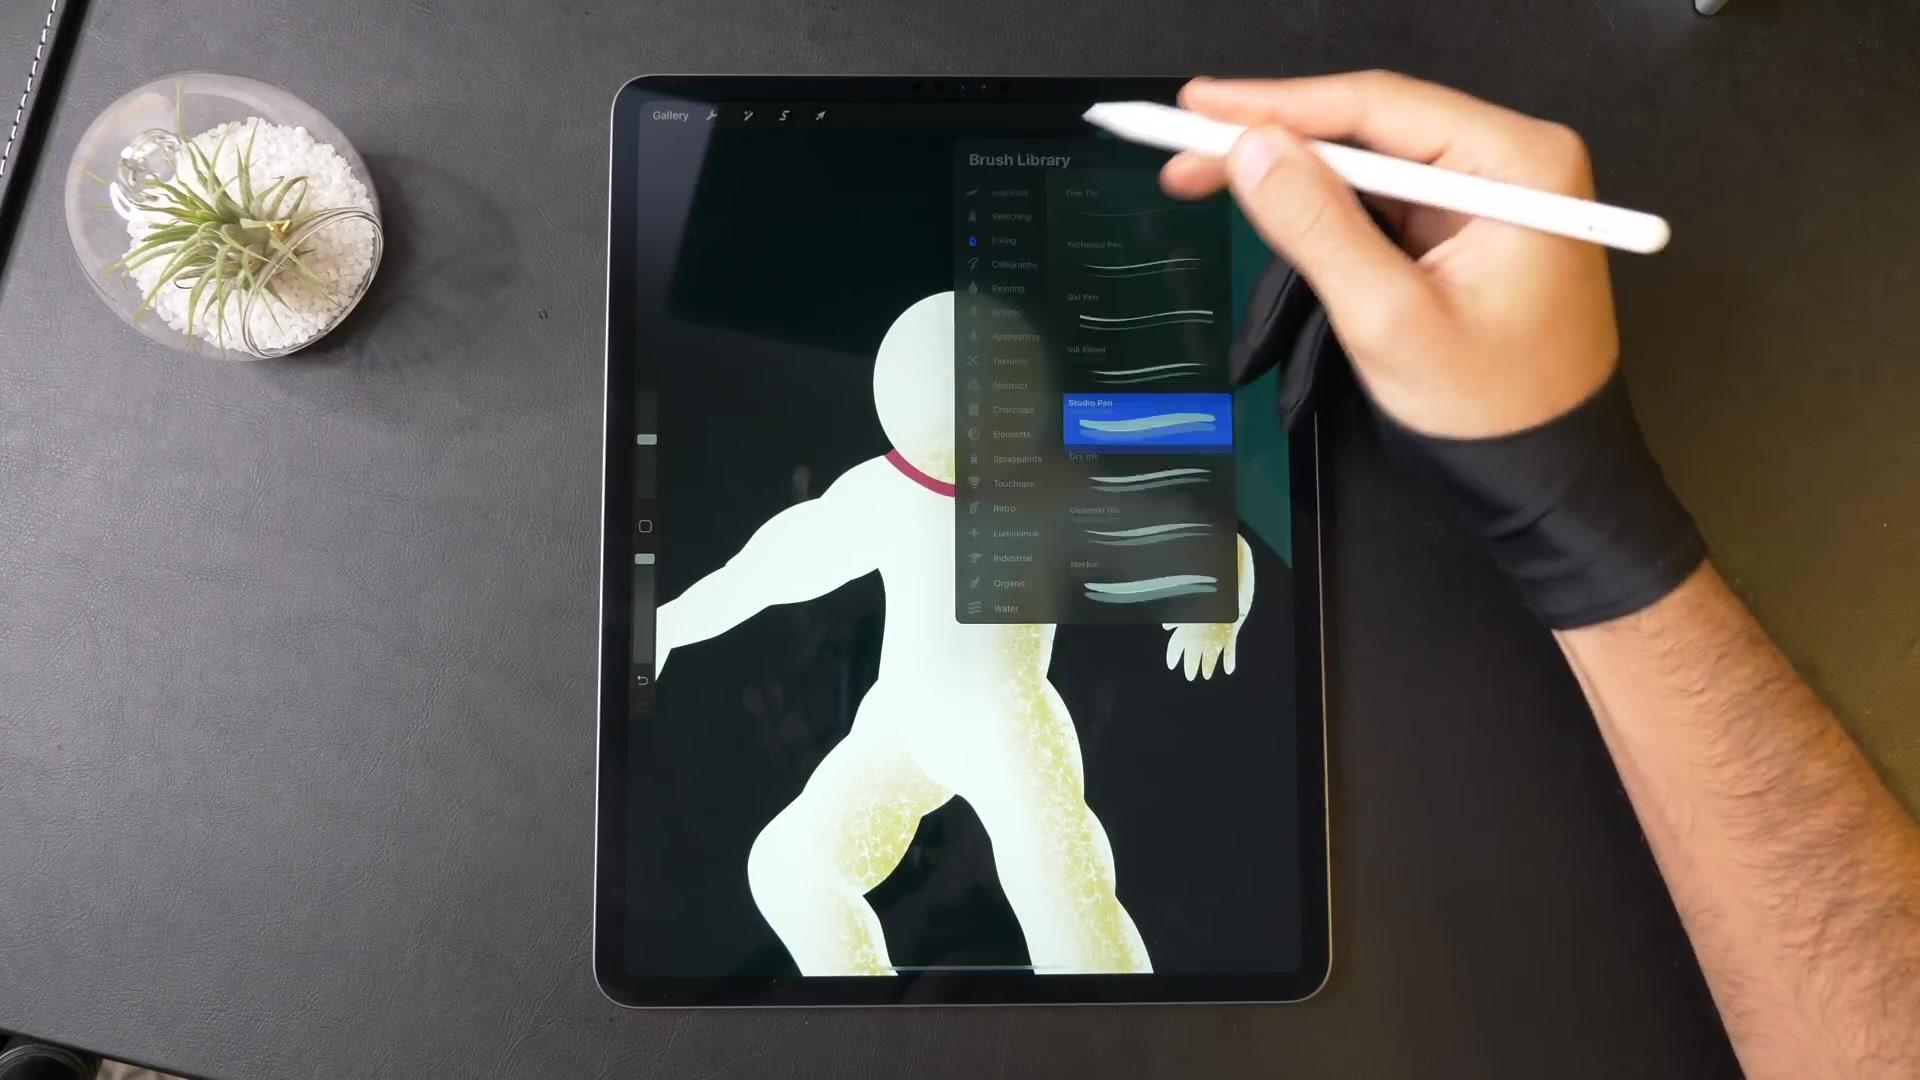 【galshir】用ipadpro画画之宇航员高中英语教学单词ppt图片